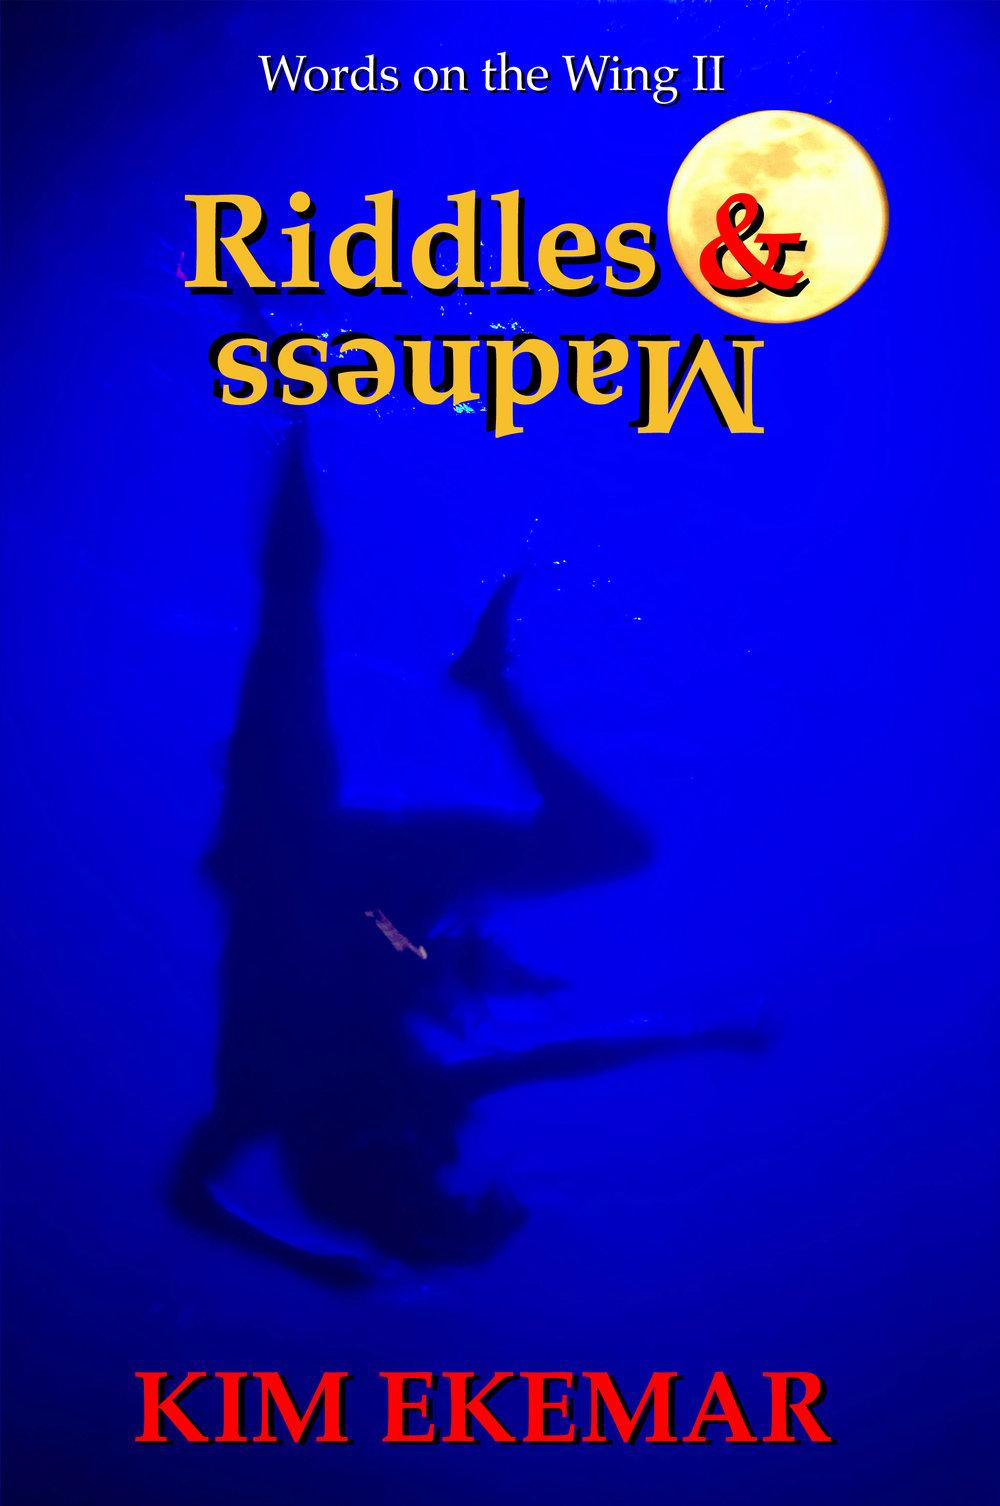 180529 EBOOK Riddles & Madness.jpg